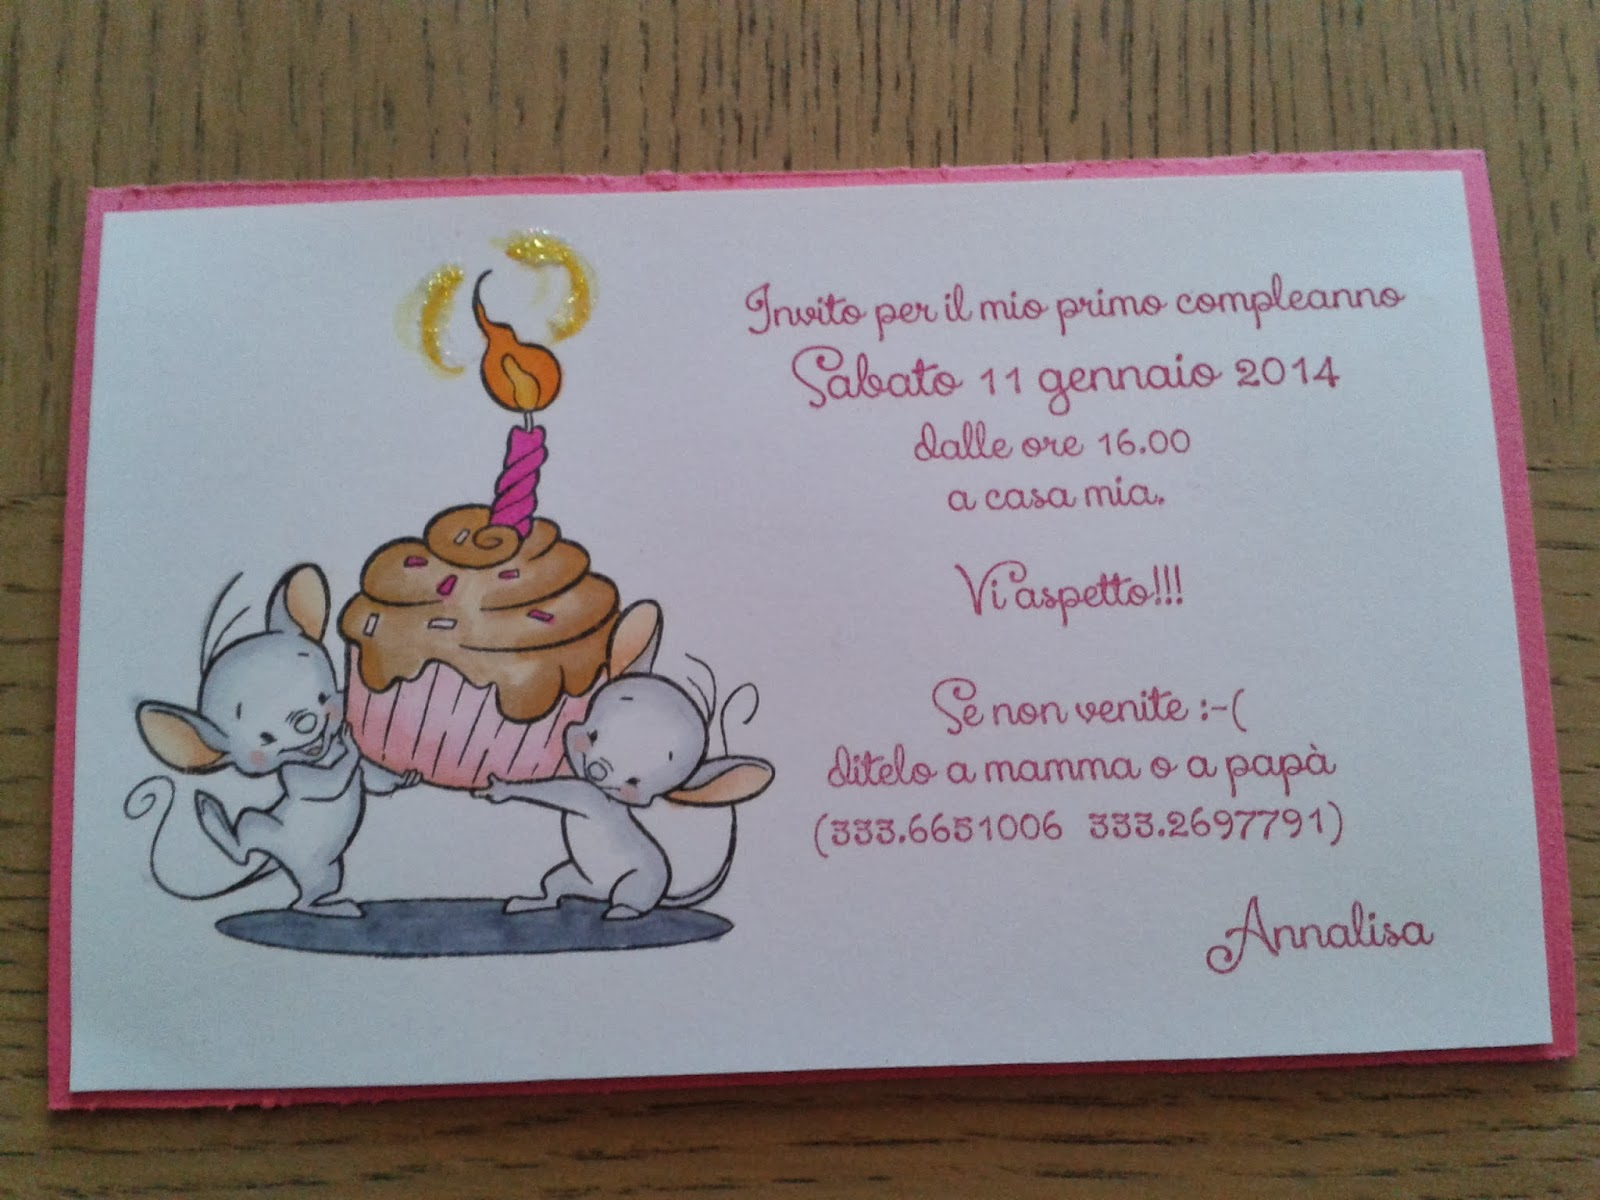 Frasi Di Auguri Di Primo Compleanno Mindy Cook Blog